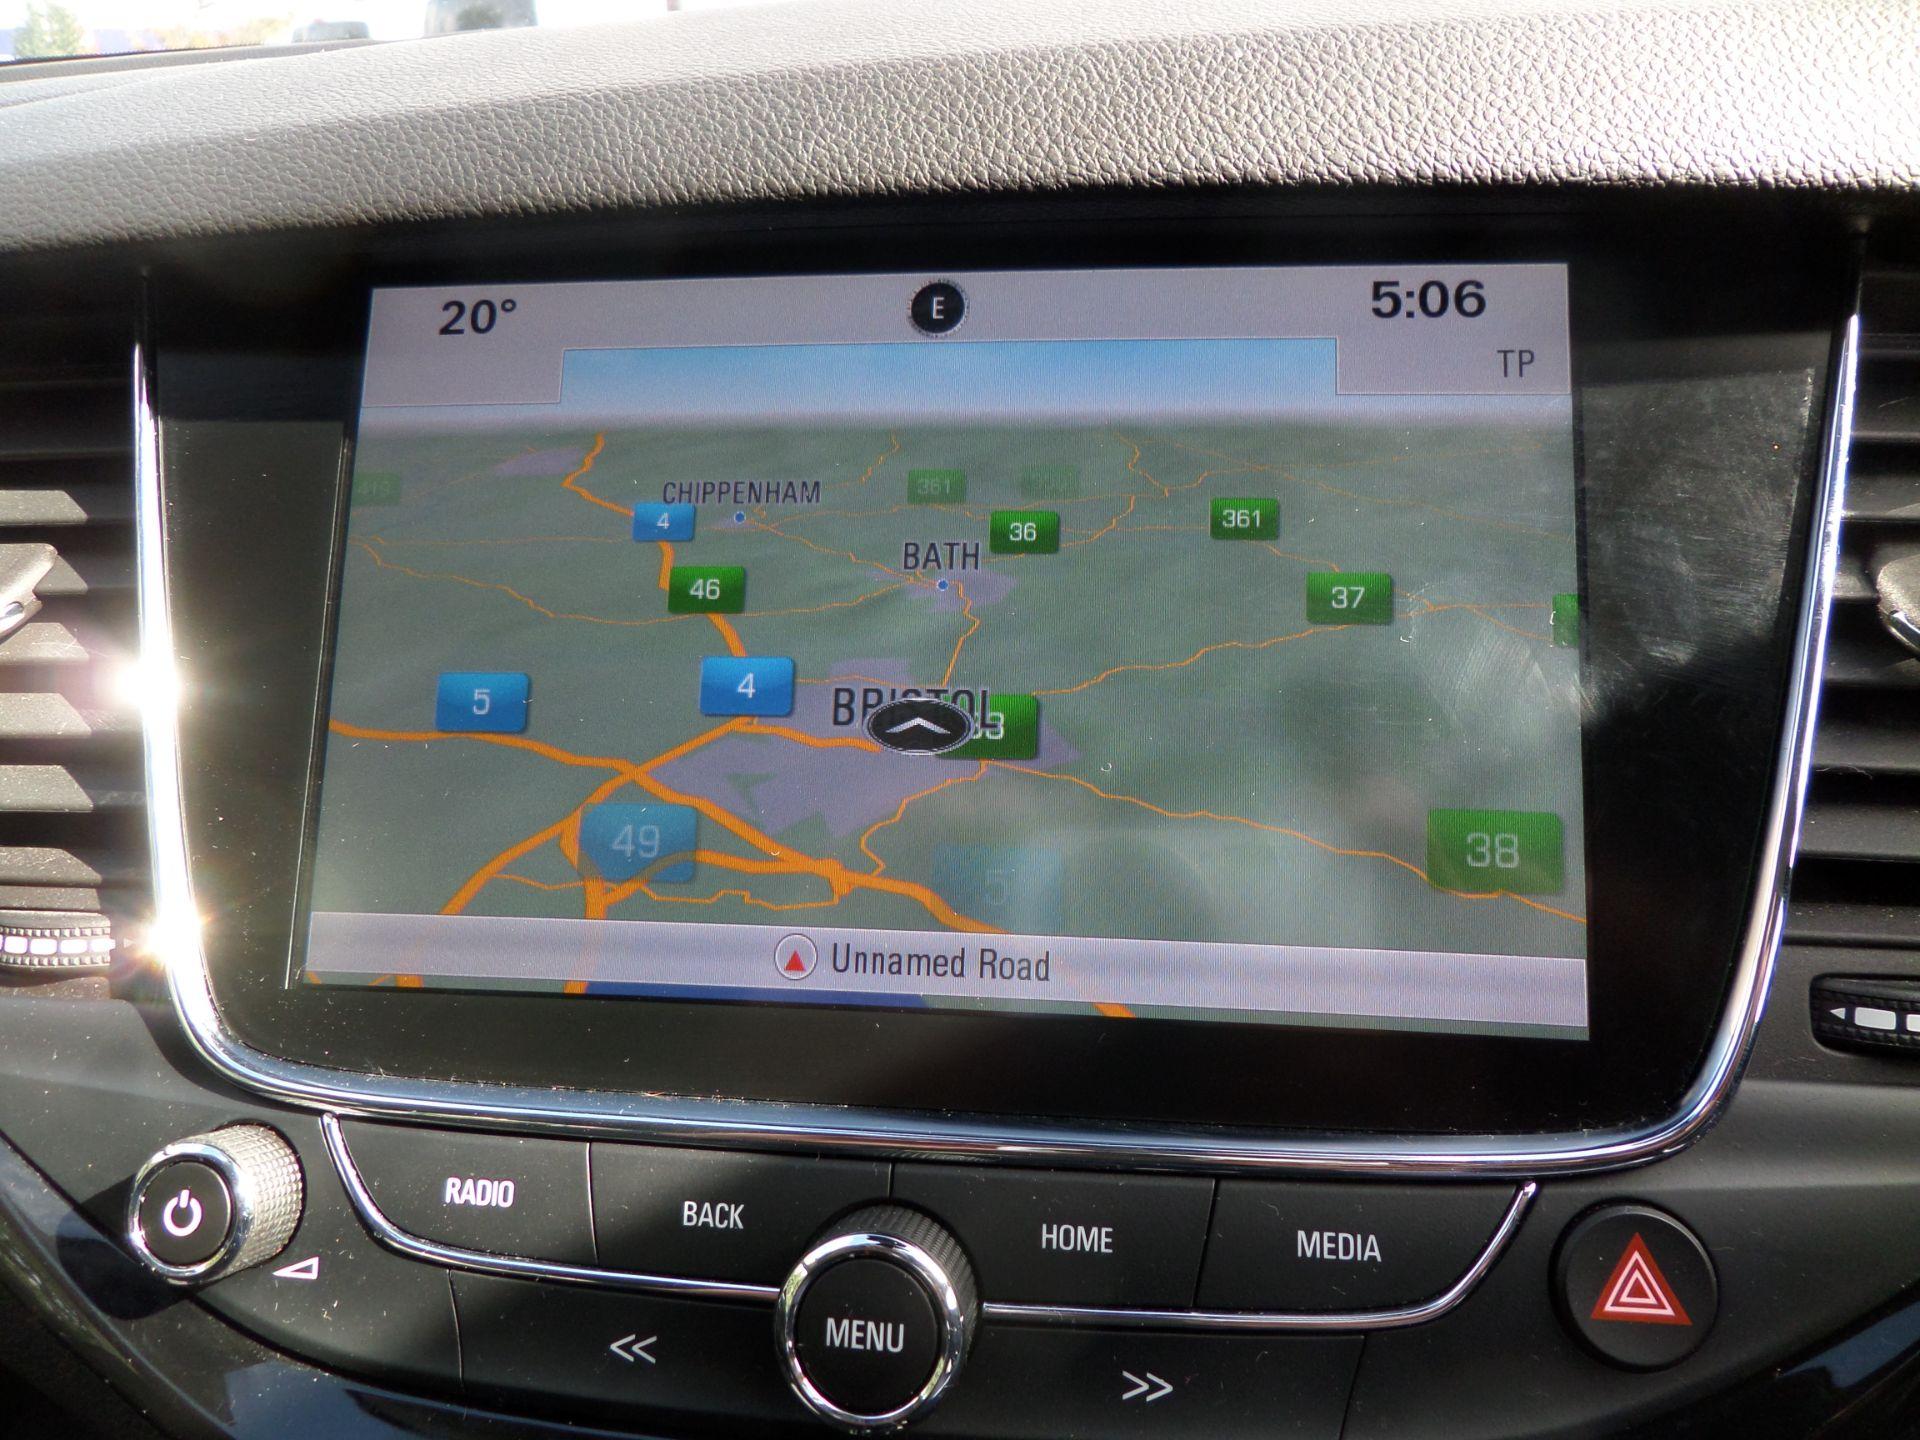 2018 Vauxhall Astra 1.6 Cdti 16V 136 Sri Nav 5Dr Euro 6 (DP18VCN) Image 12